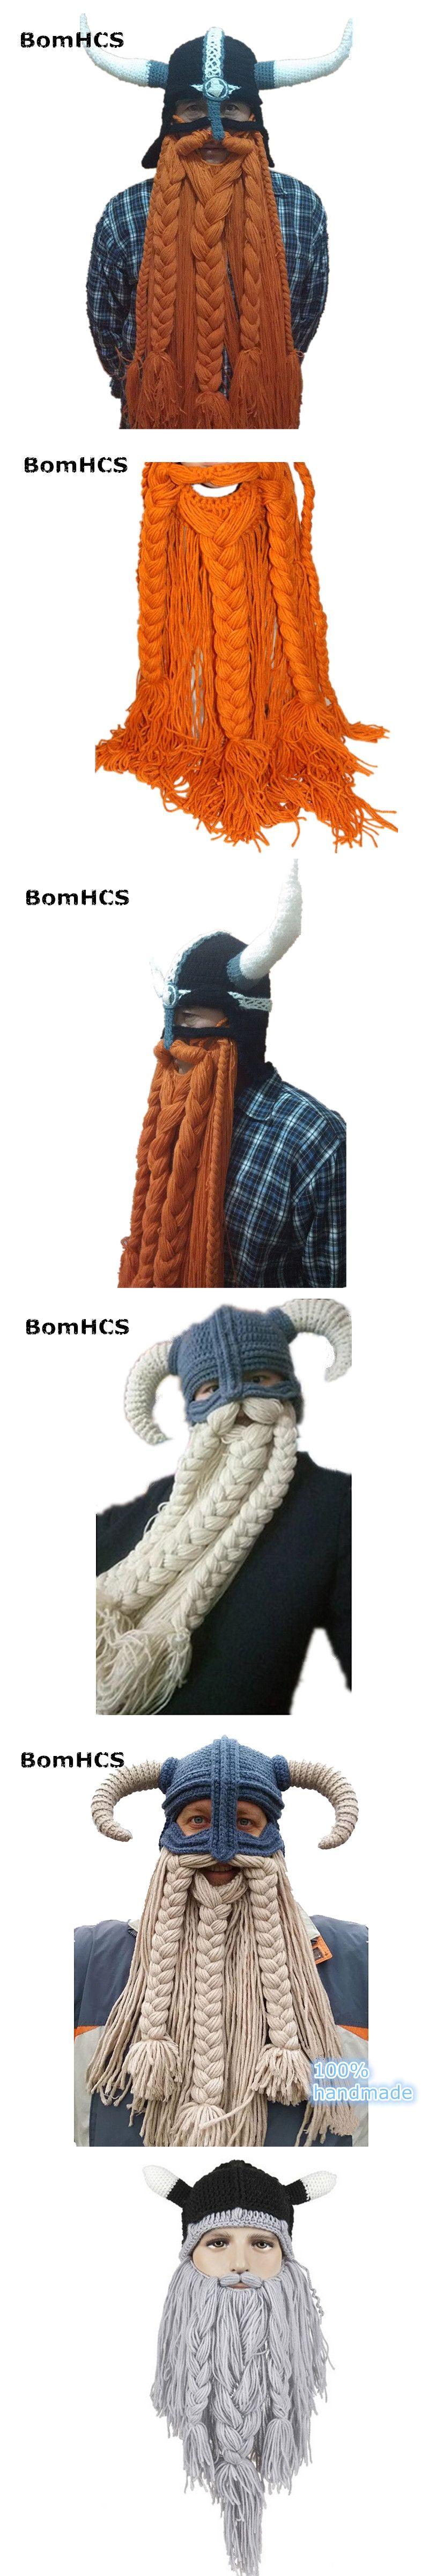 85f383c84dd BomHCS Funny Party Halloween Cap Men s Head Beard Beanie Horn Hat Handmade  Winter Warm Birthday Gift